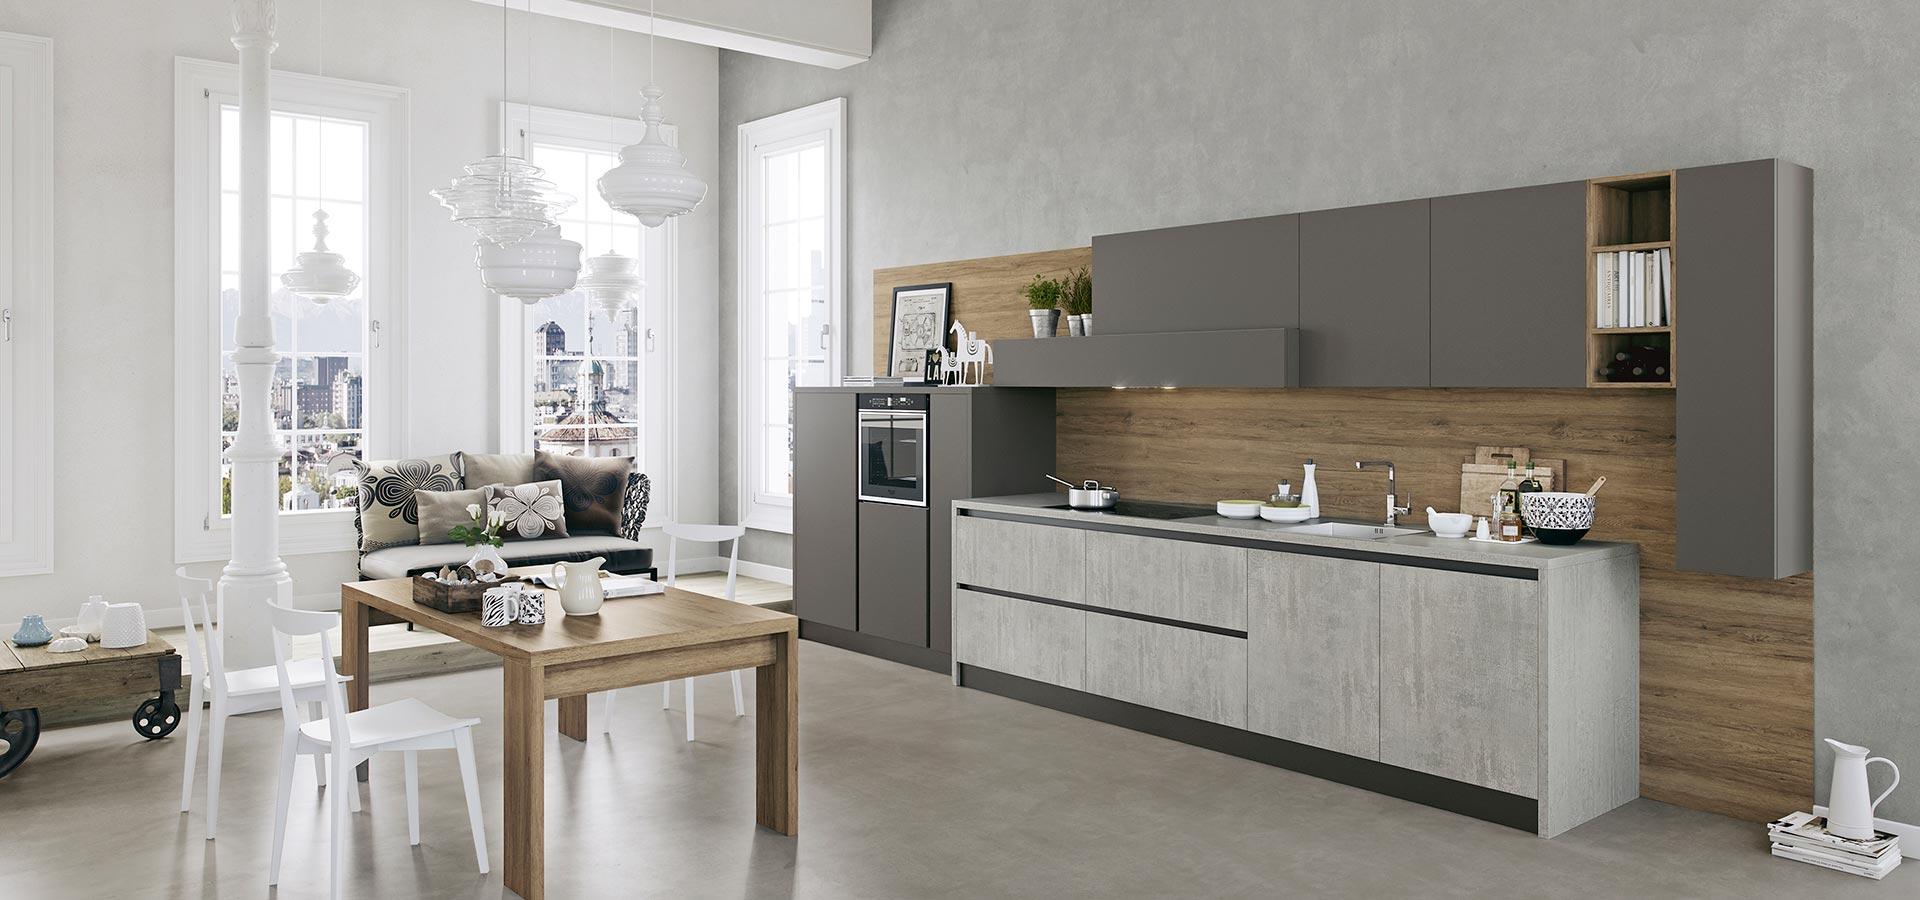 KALI — modern kitchen | ARREDO3